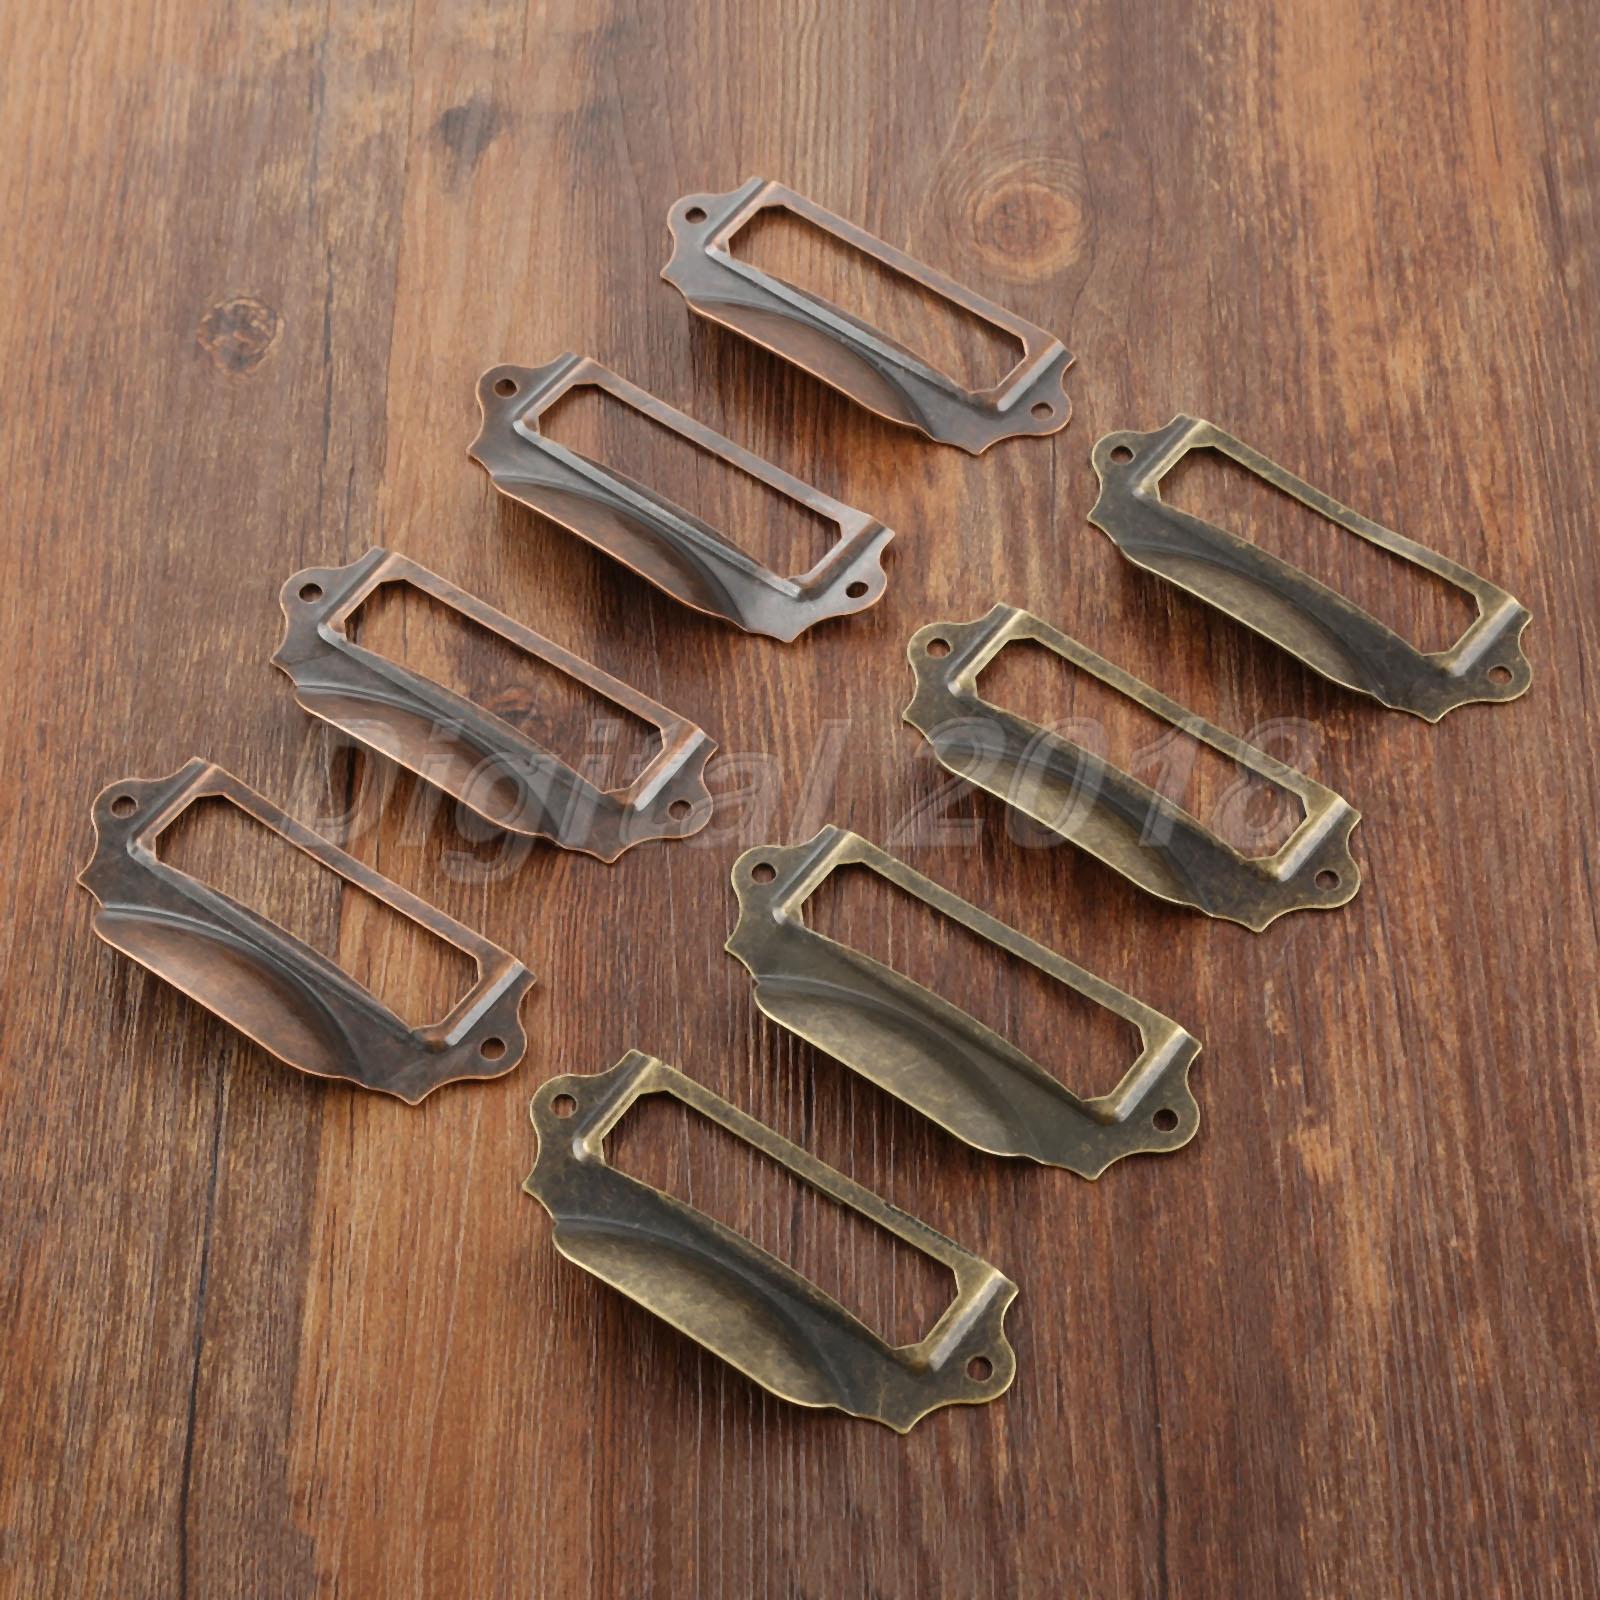 - l45 5557mm 4 Small Tags Pulls 2.162.24 Vintage Metal Nose Drawer Pulls Card  Handle Label Frames